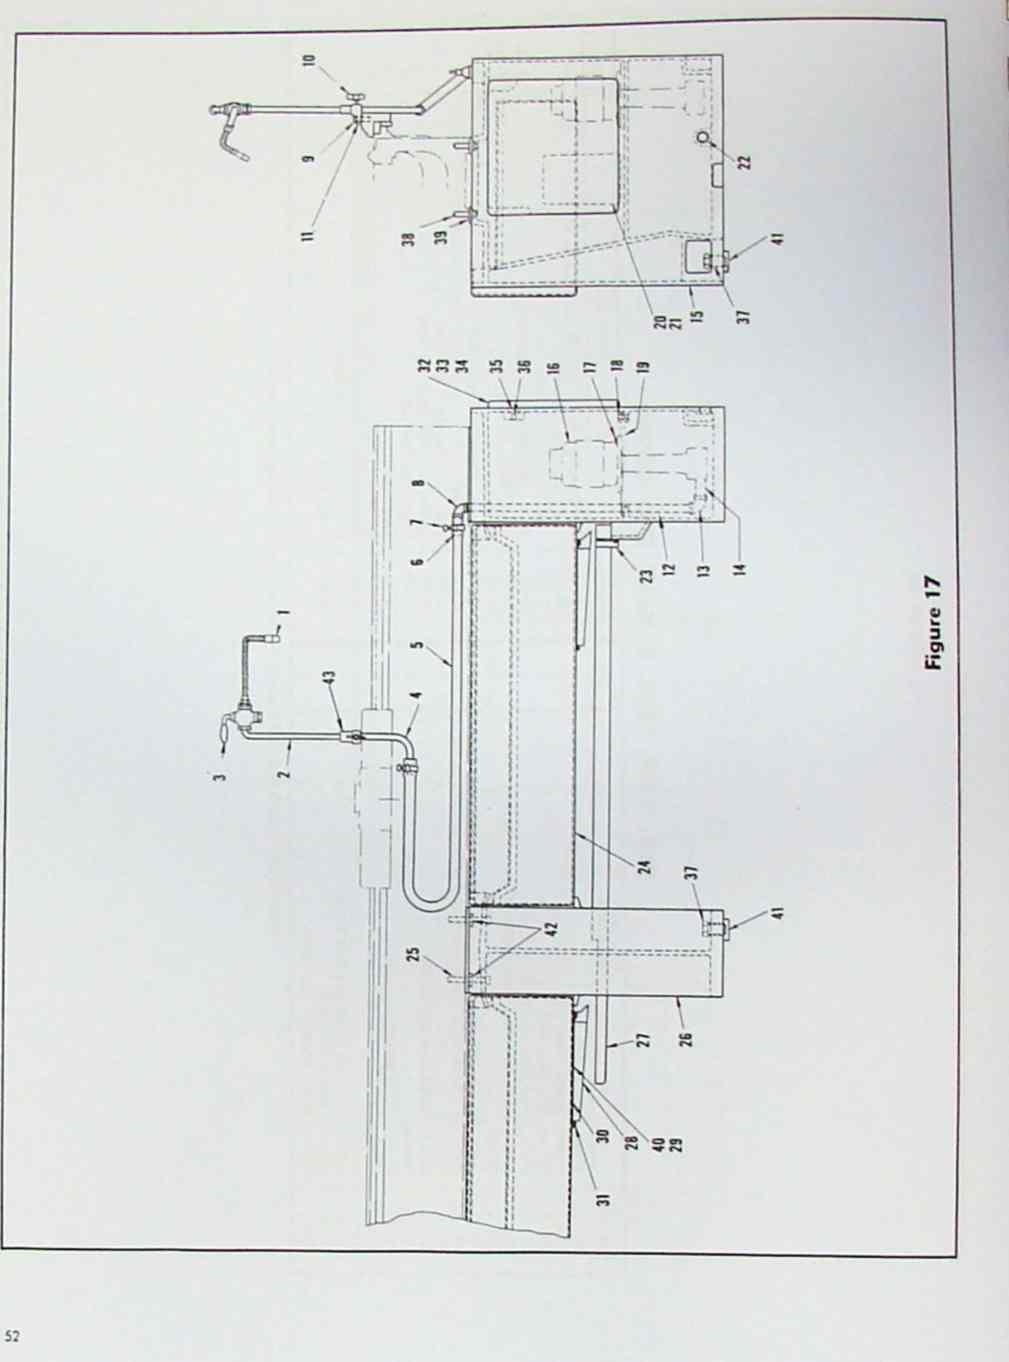 hight resolution of leblond 13c3 15c5 17e5 19e7 lathe operator parts manual